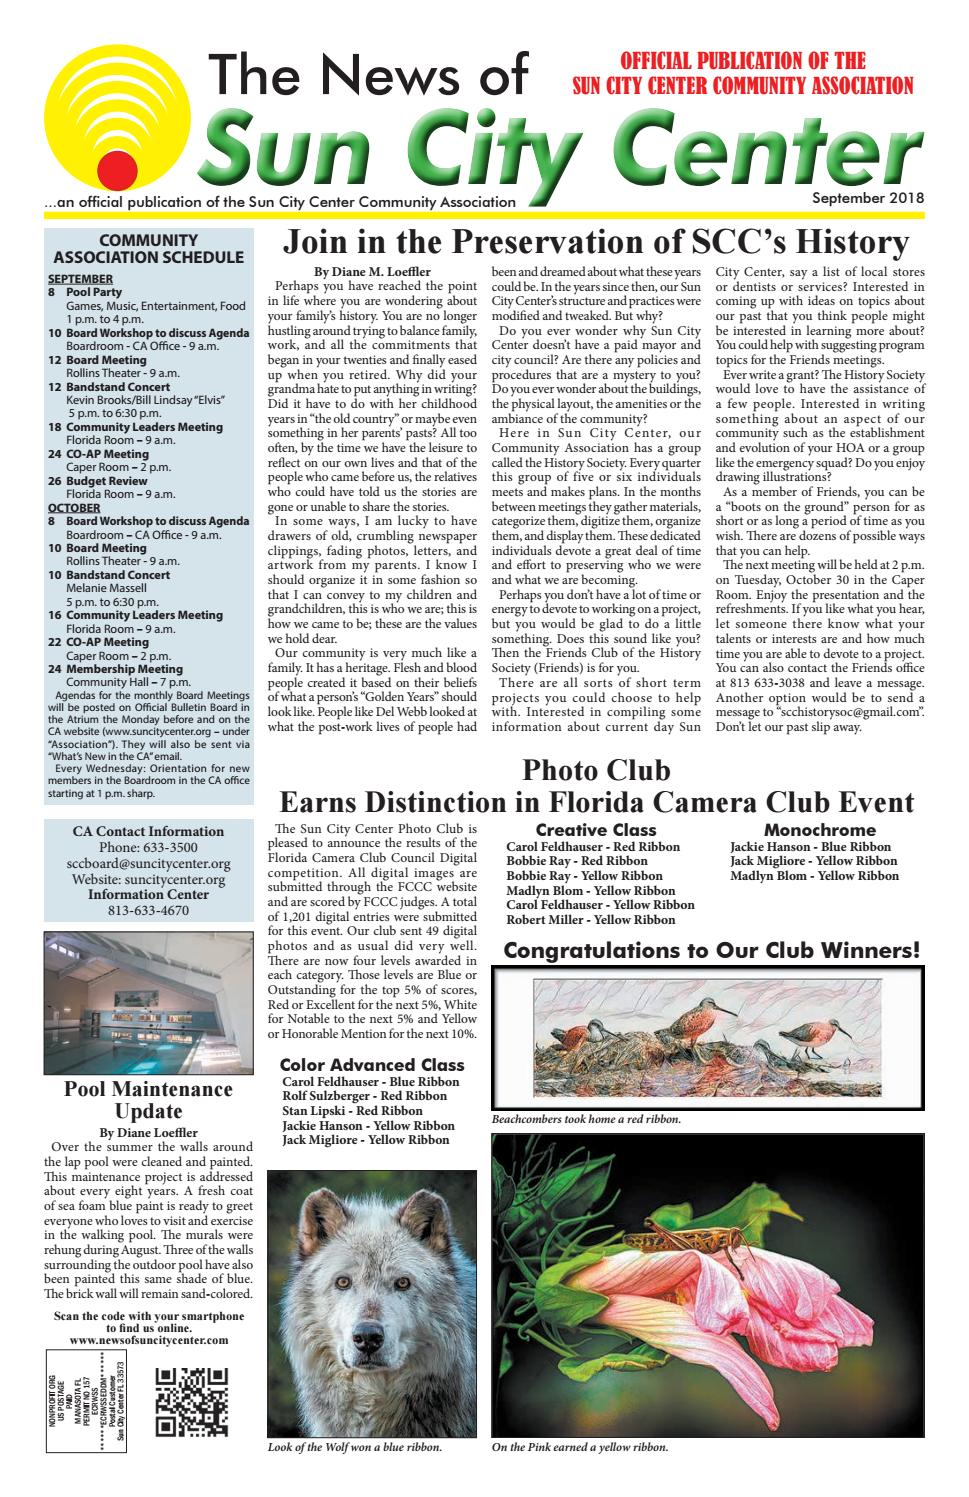 83d3864c7b00 News of Sun City Center September 2018 by The News of Sun City Center &  South County - issuu